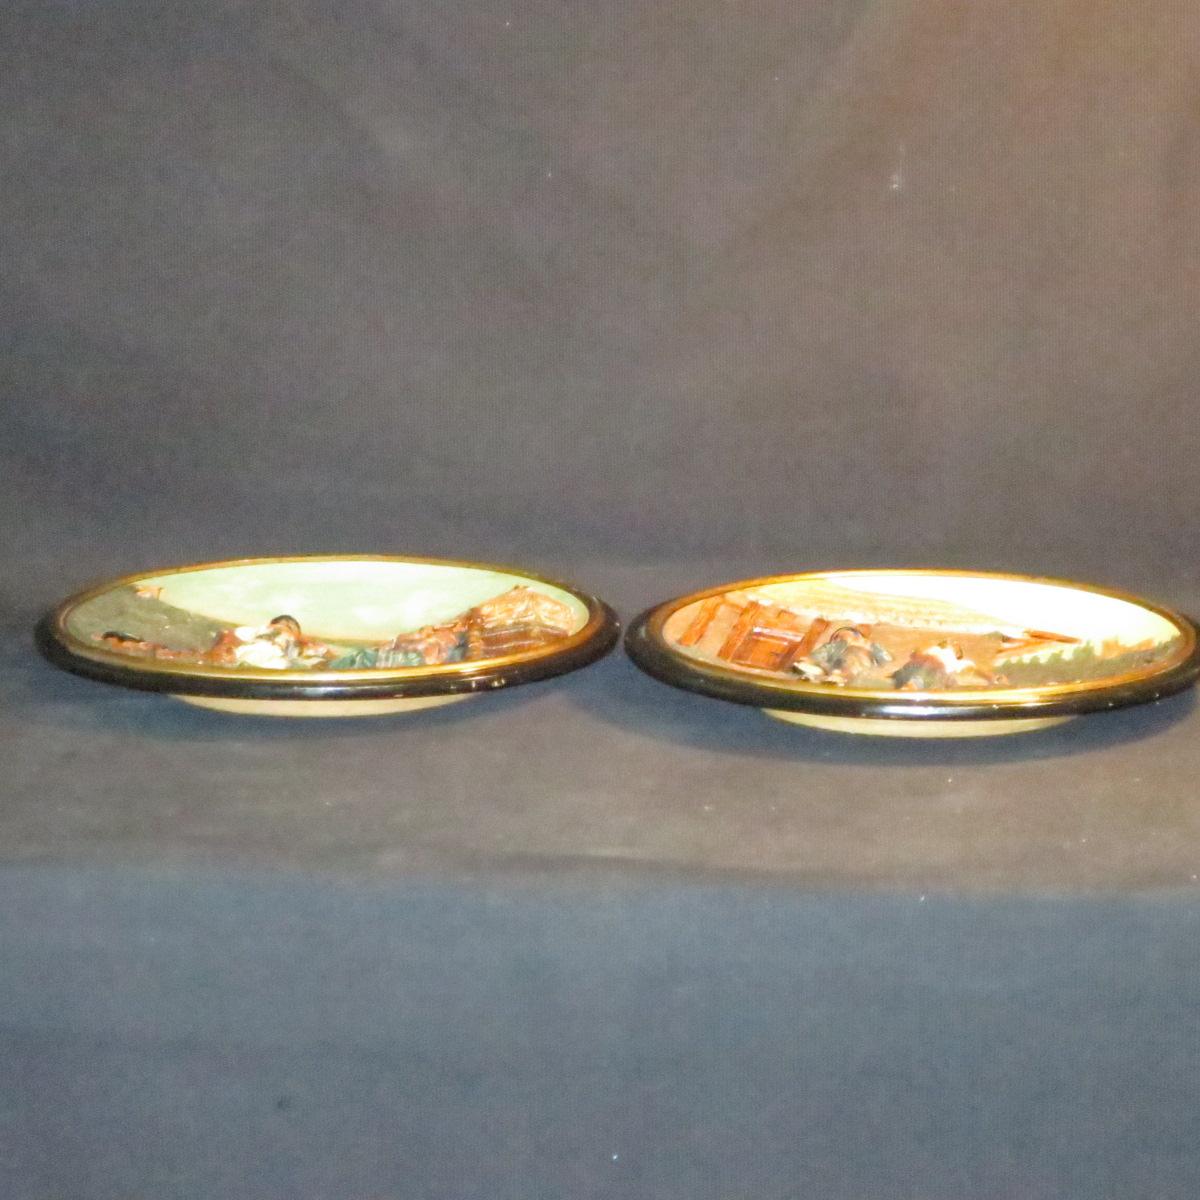 Johann Maresch Pair Of Plates Plates Pottery Central European Gypsies-photo-5